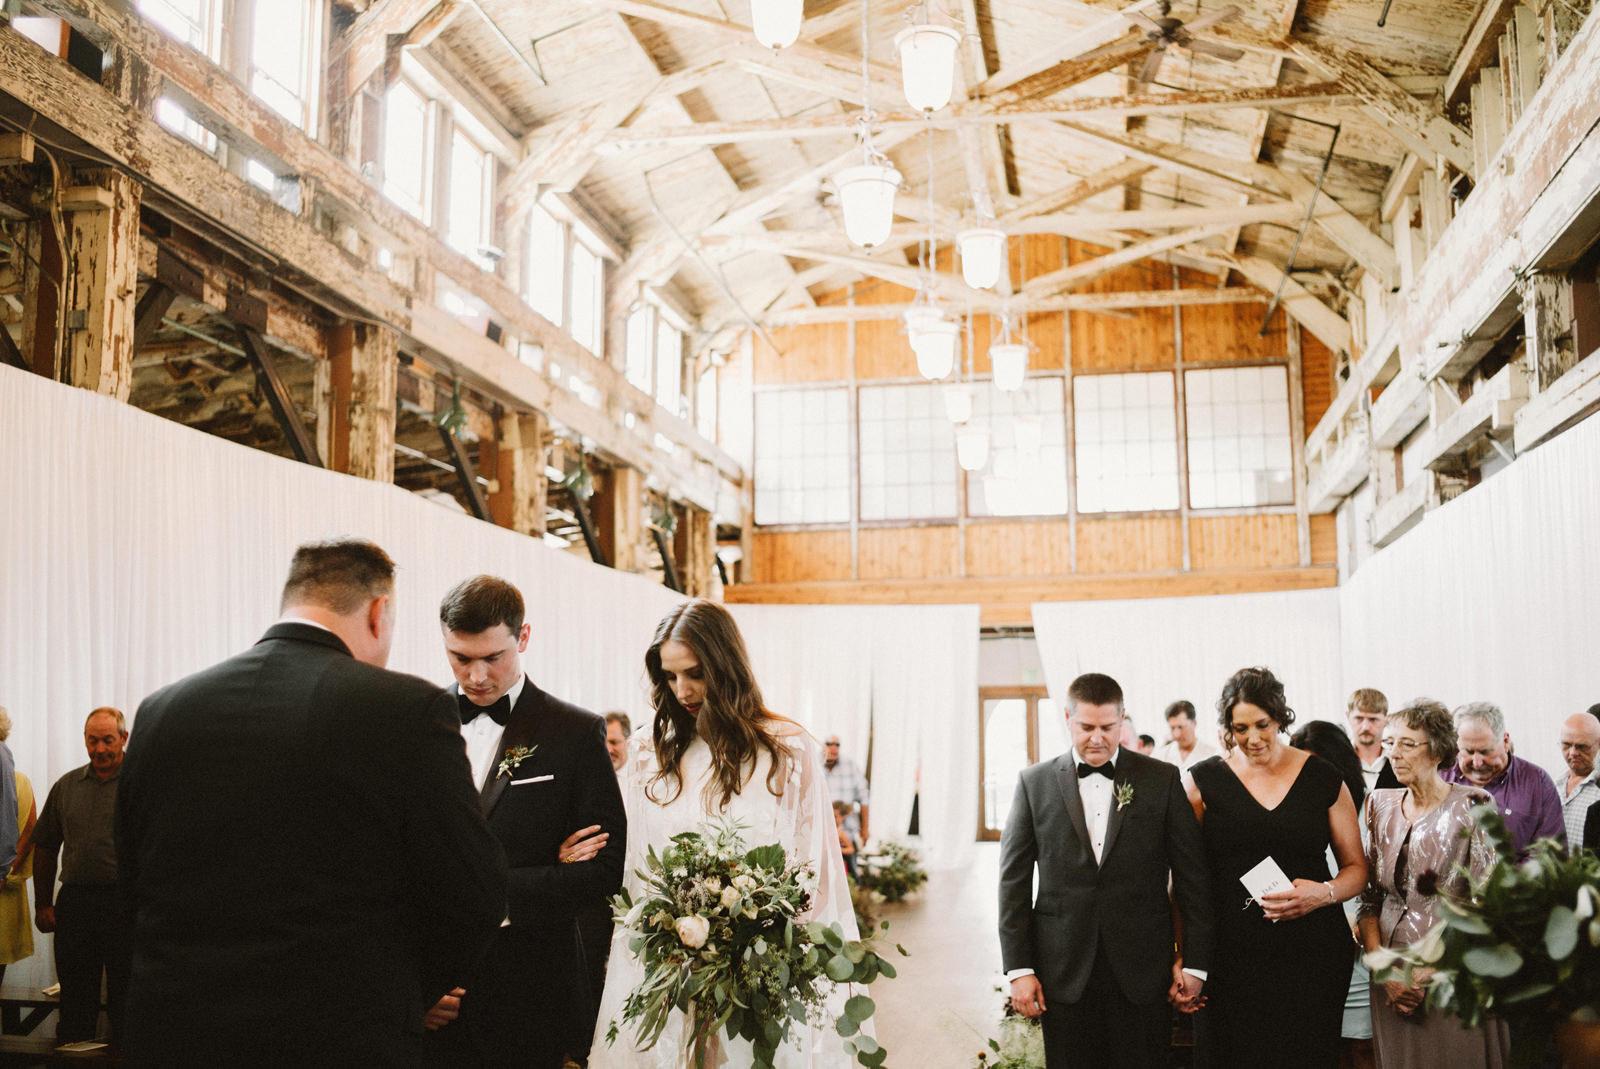 sodo-park-wedding-039 SODO PARK WEDDING